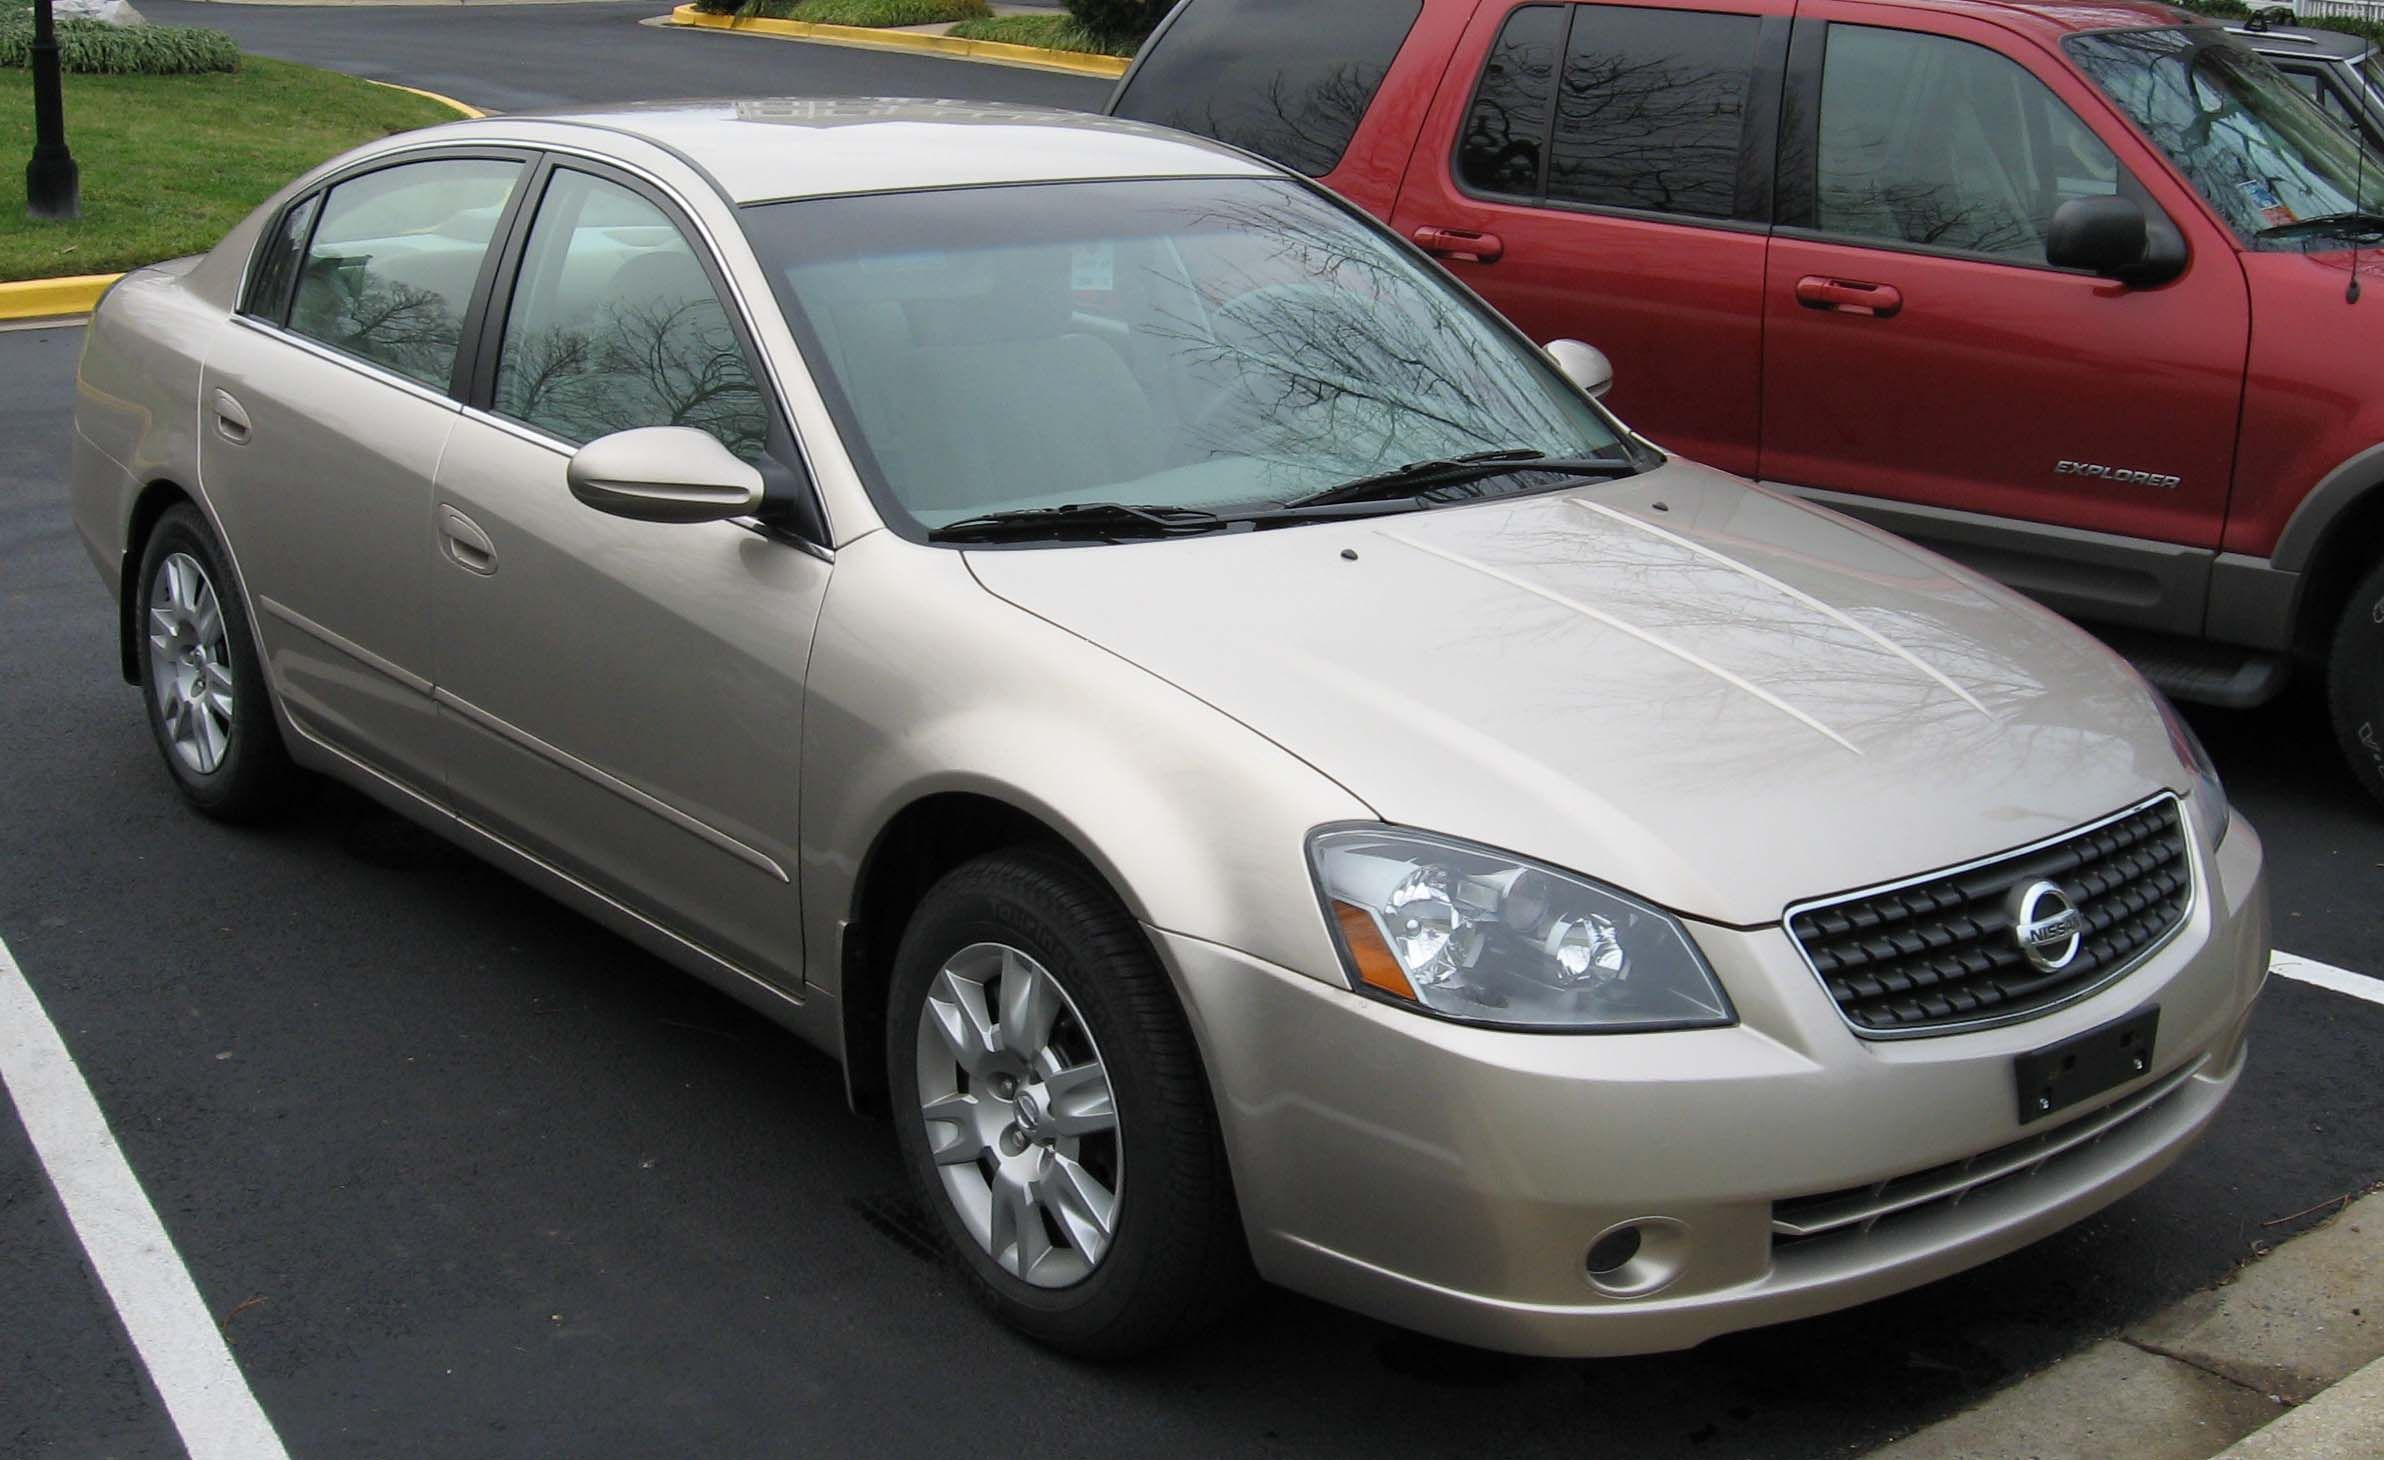 Nissan altima 2005 first car pinterest nissan altima nissan nissan altima 2005 vanachro Image collections